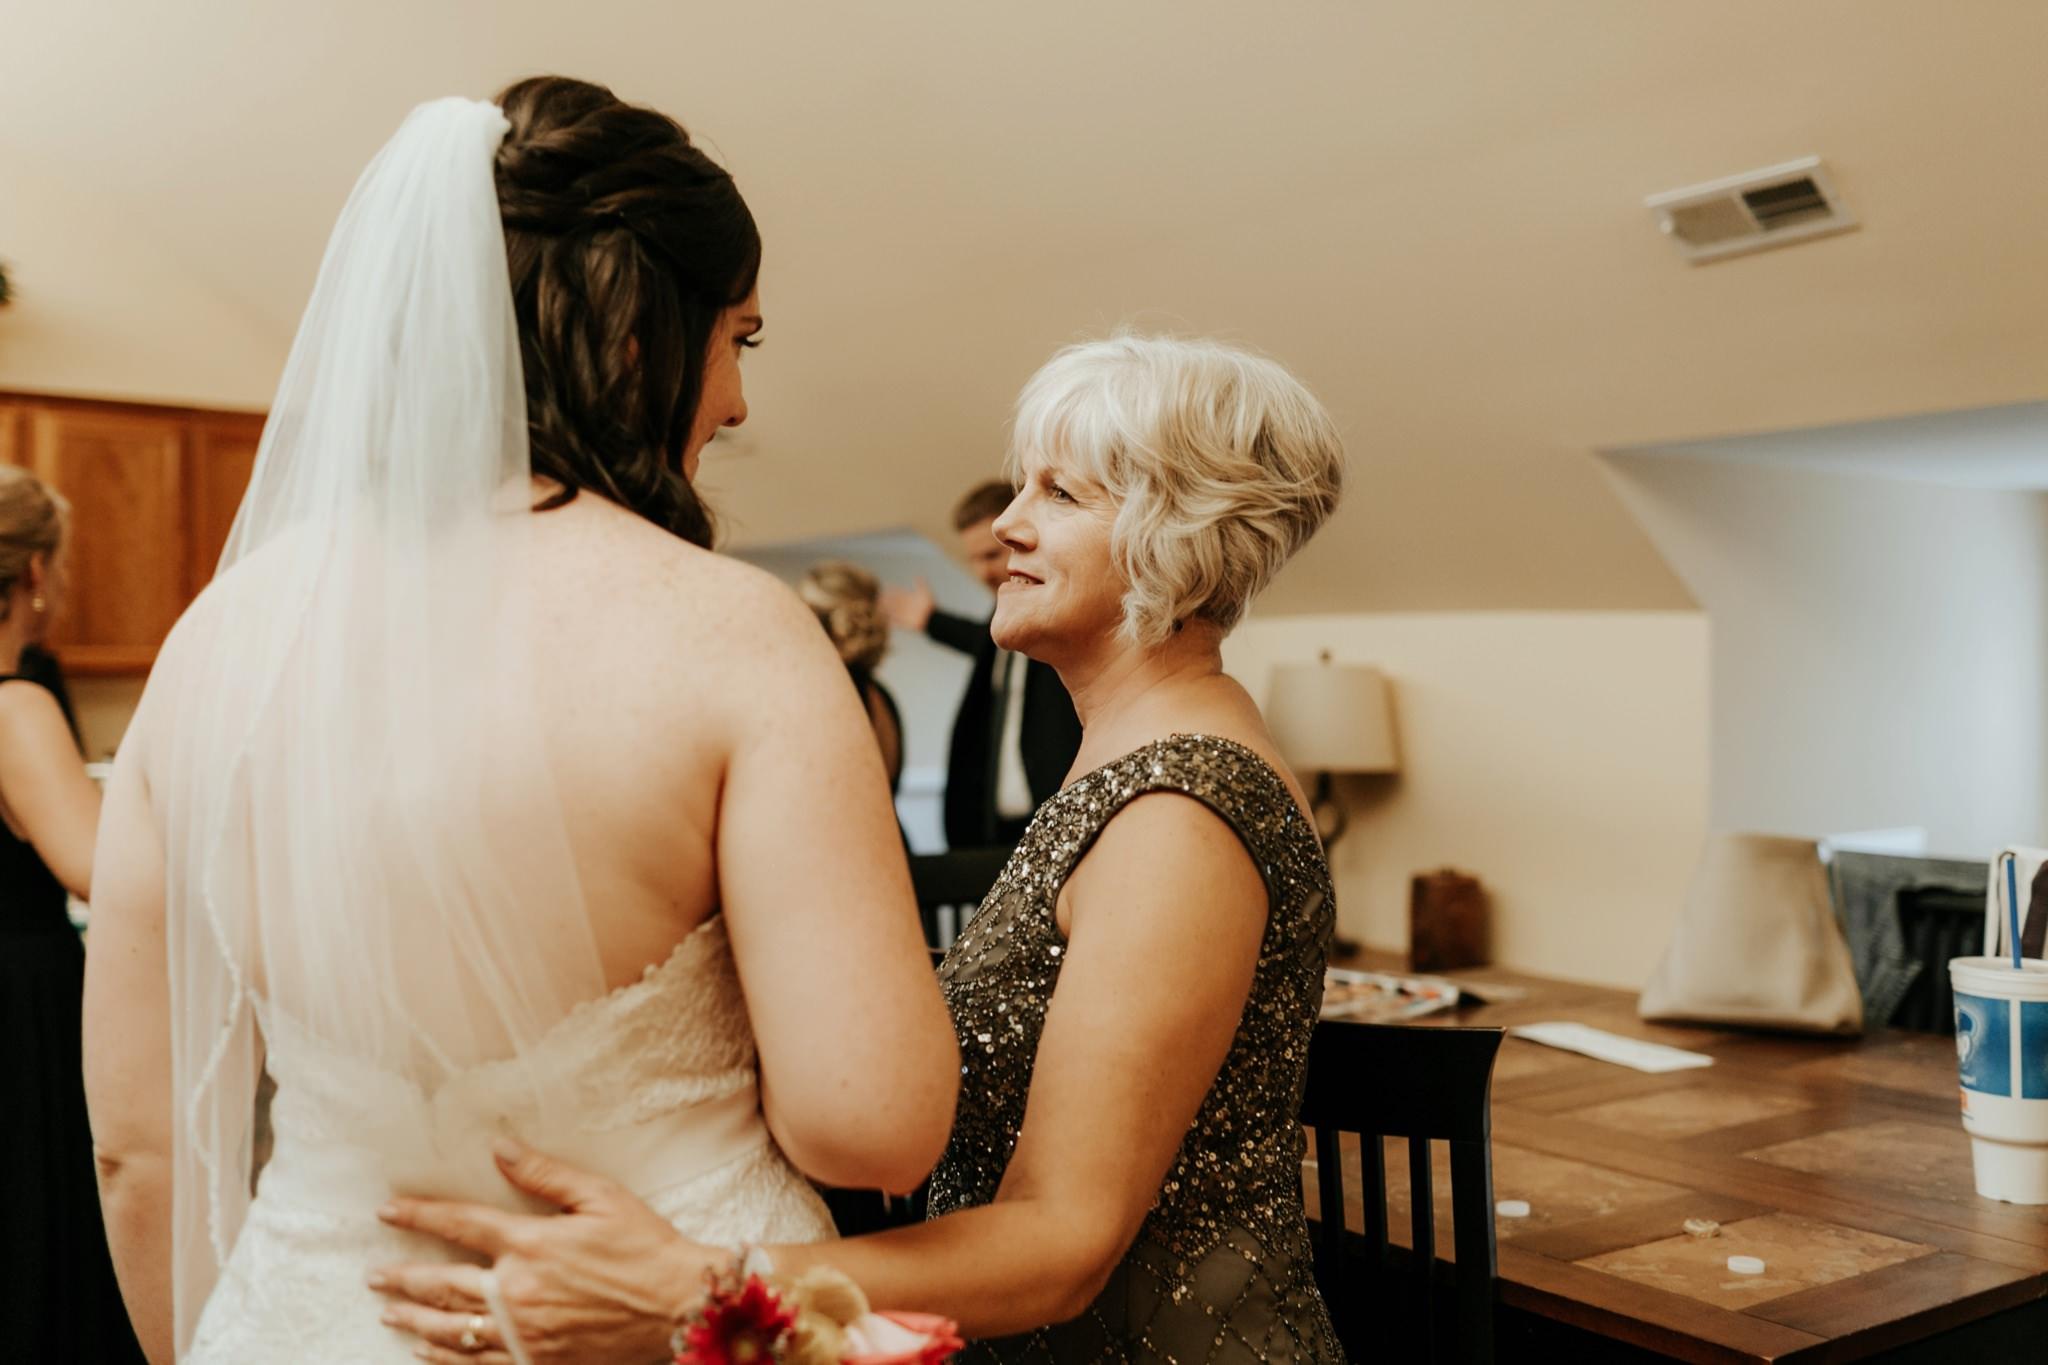 17-09-15 Lindsey and Brandon Wedding Edited-796_WEB.jpg